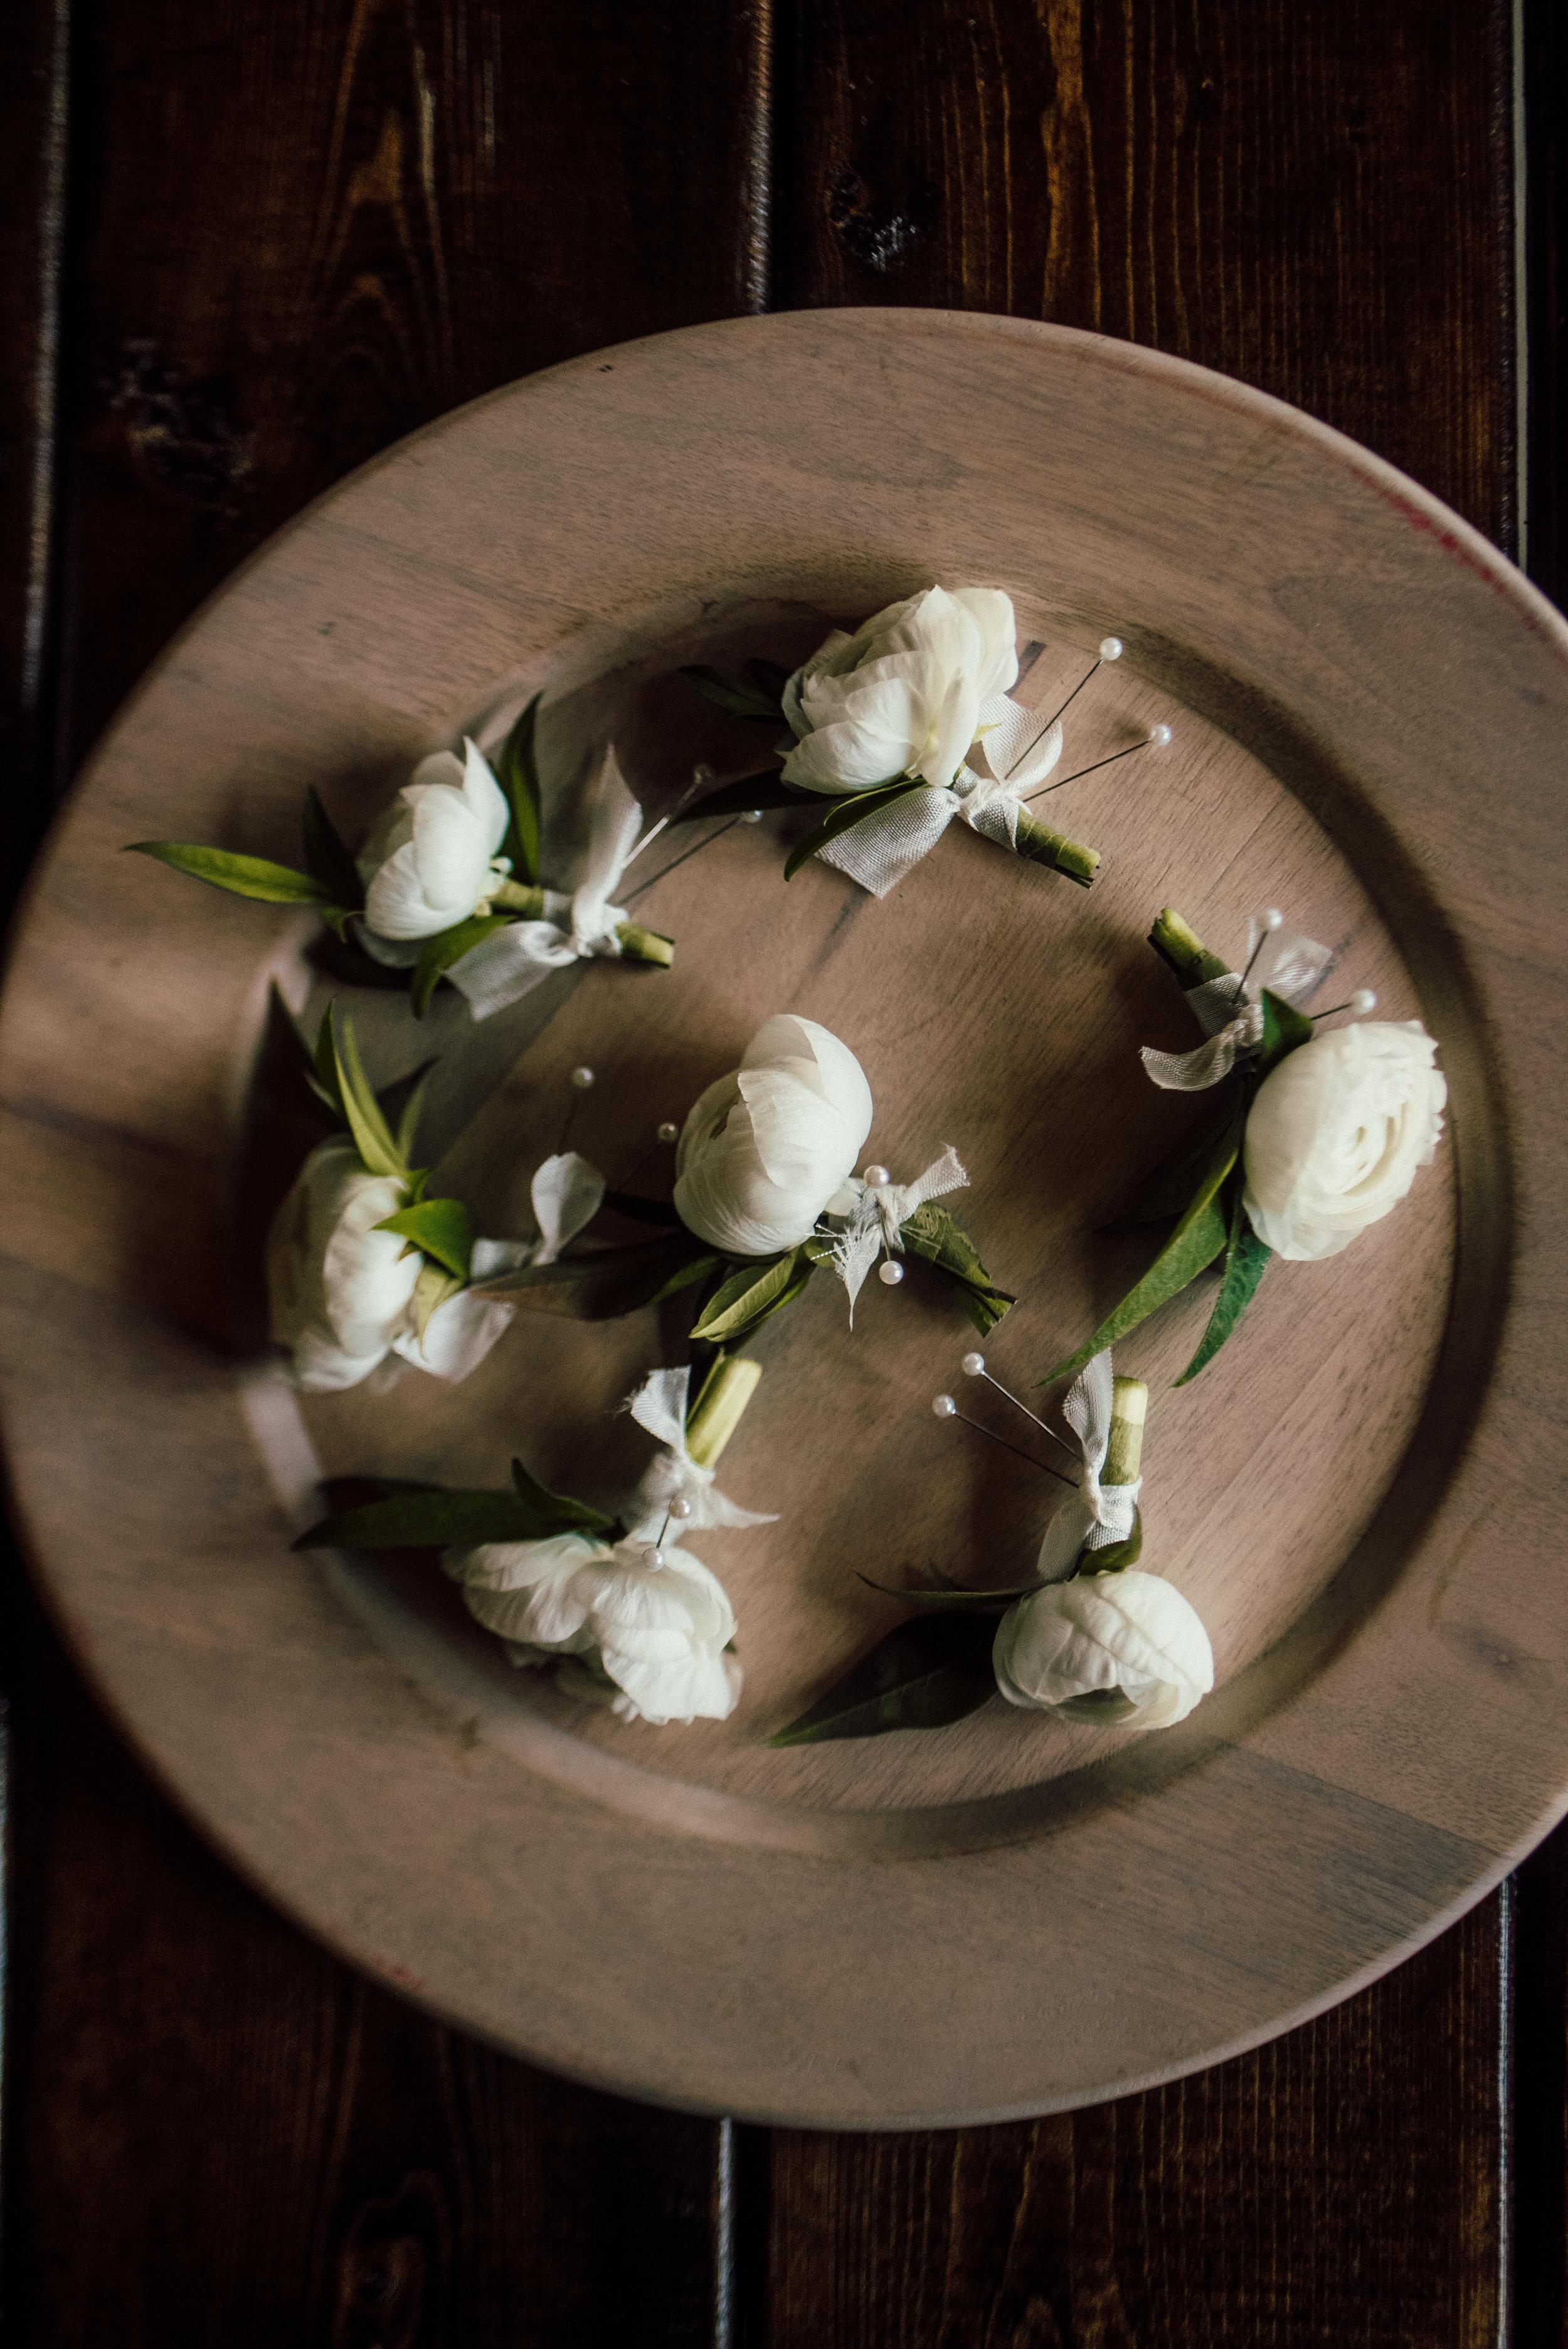 Floral Details - Santa Fe, New Mexico - Summer Wedding - Julian Leaver Events